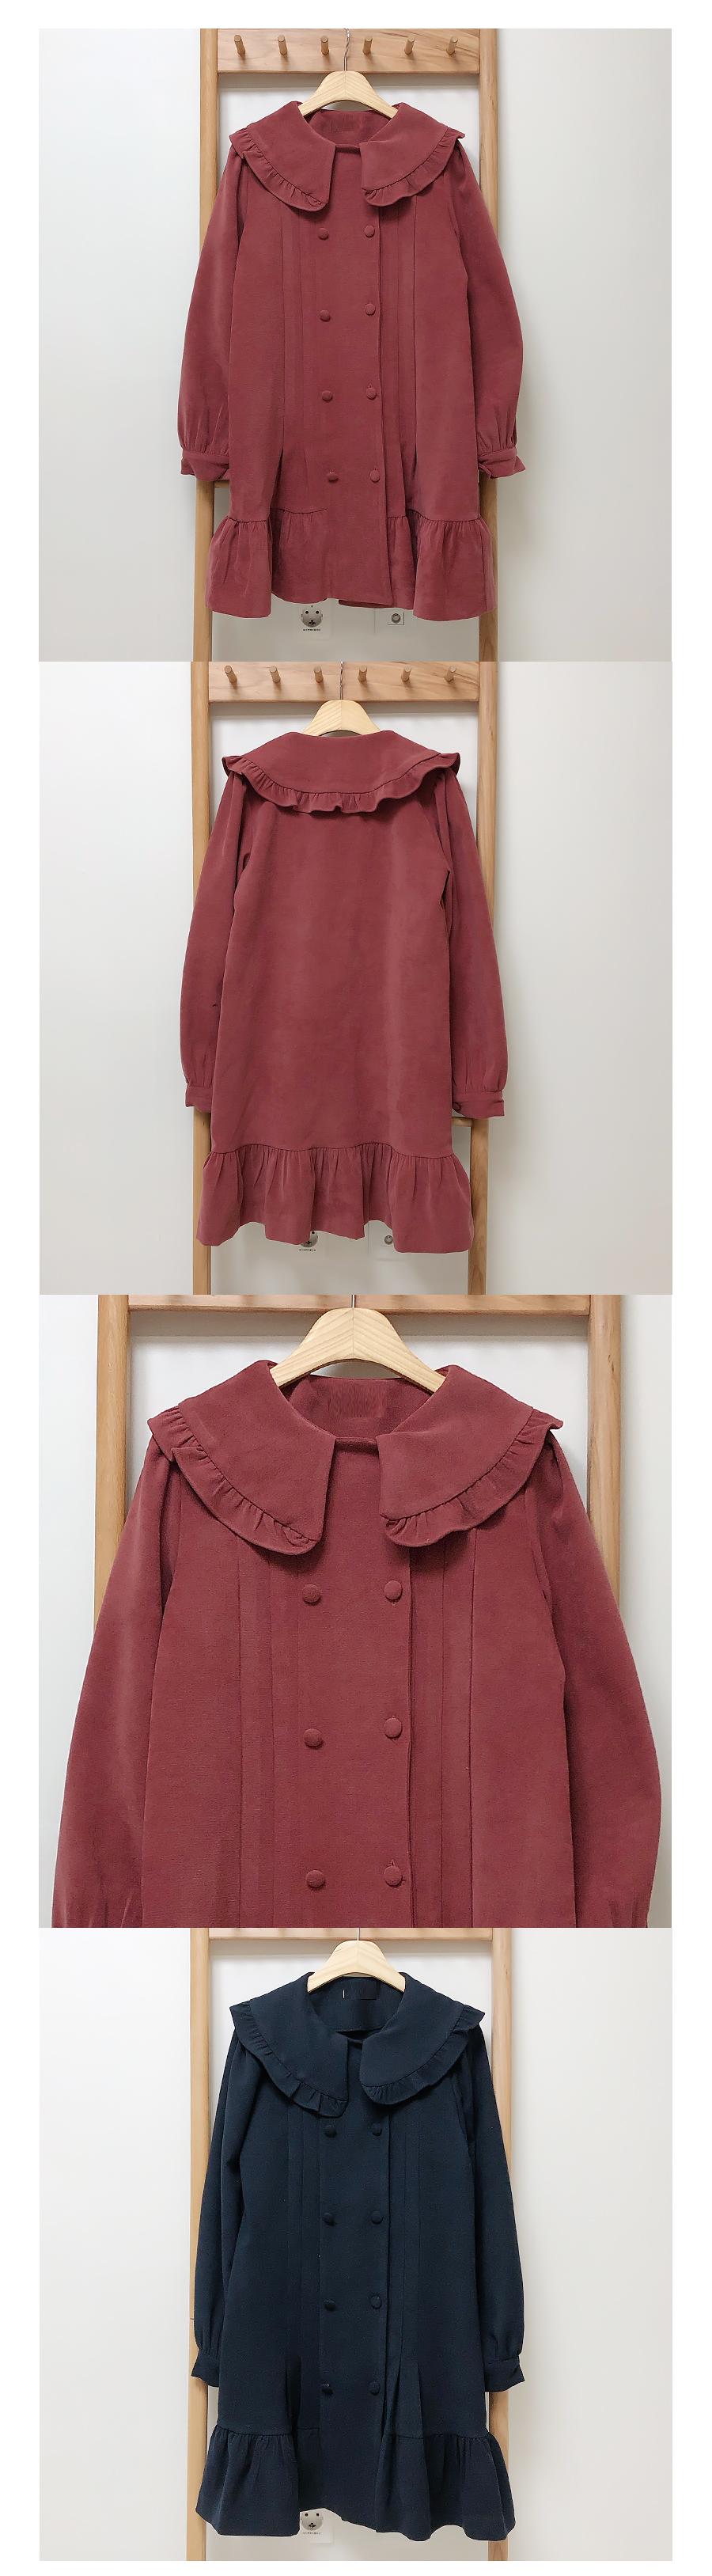 Belt set ♥ Lancome collar pin tuck dress